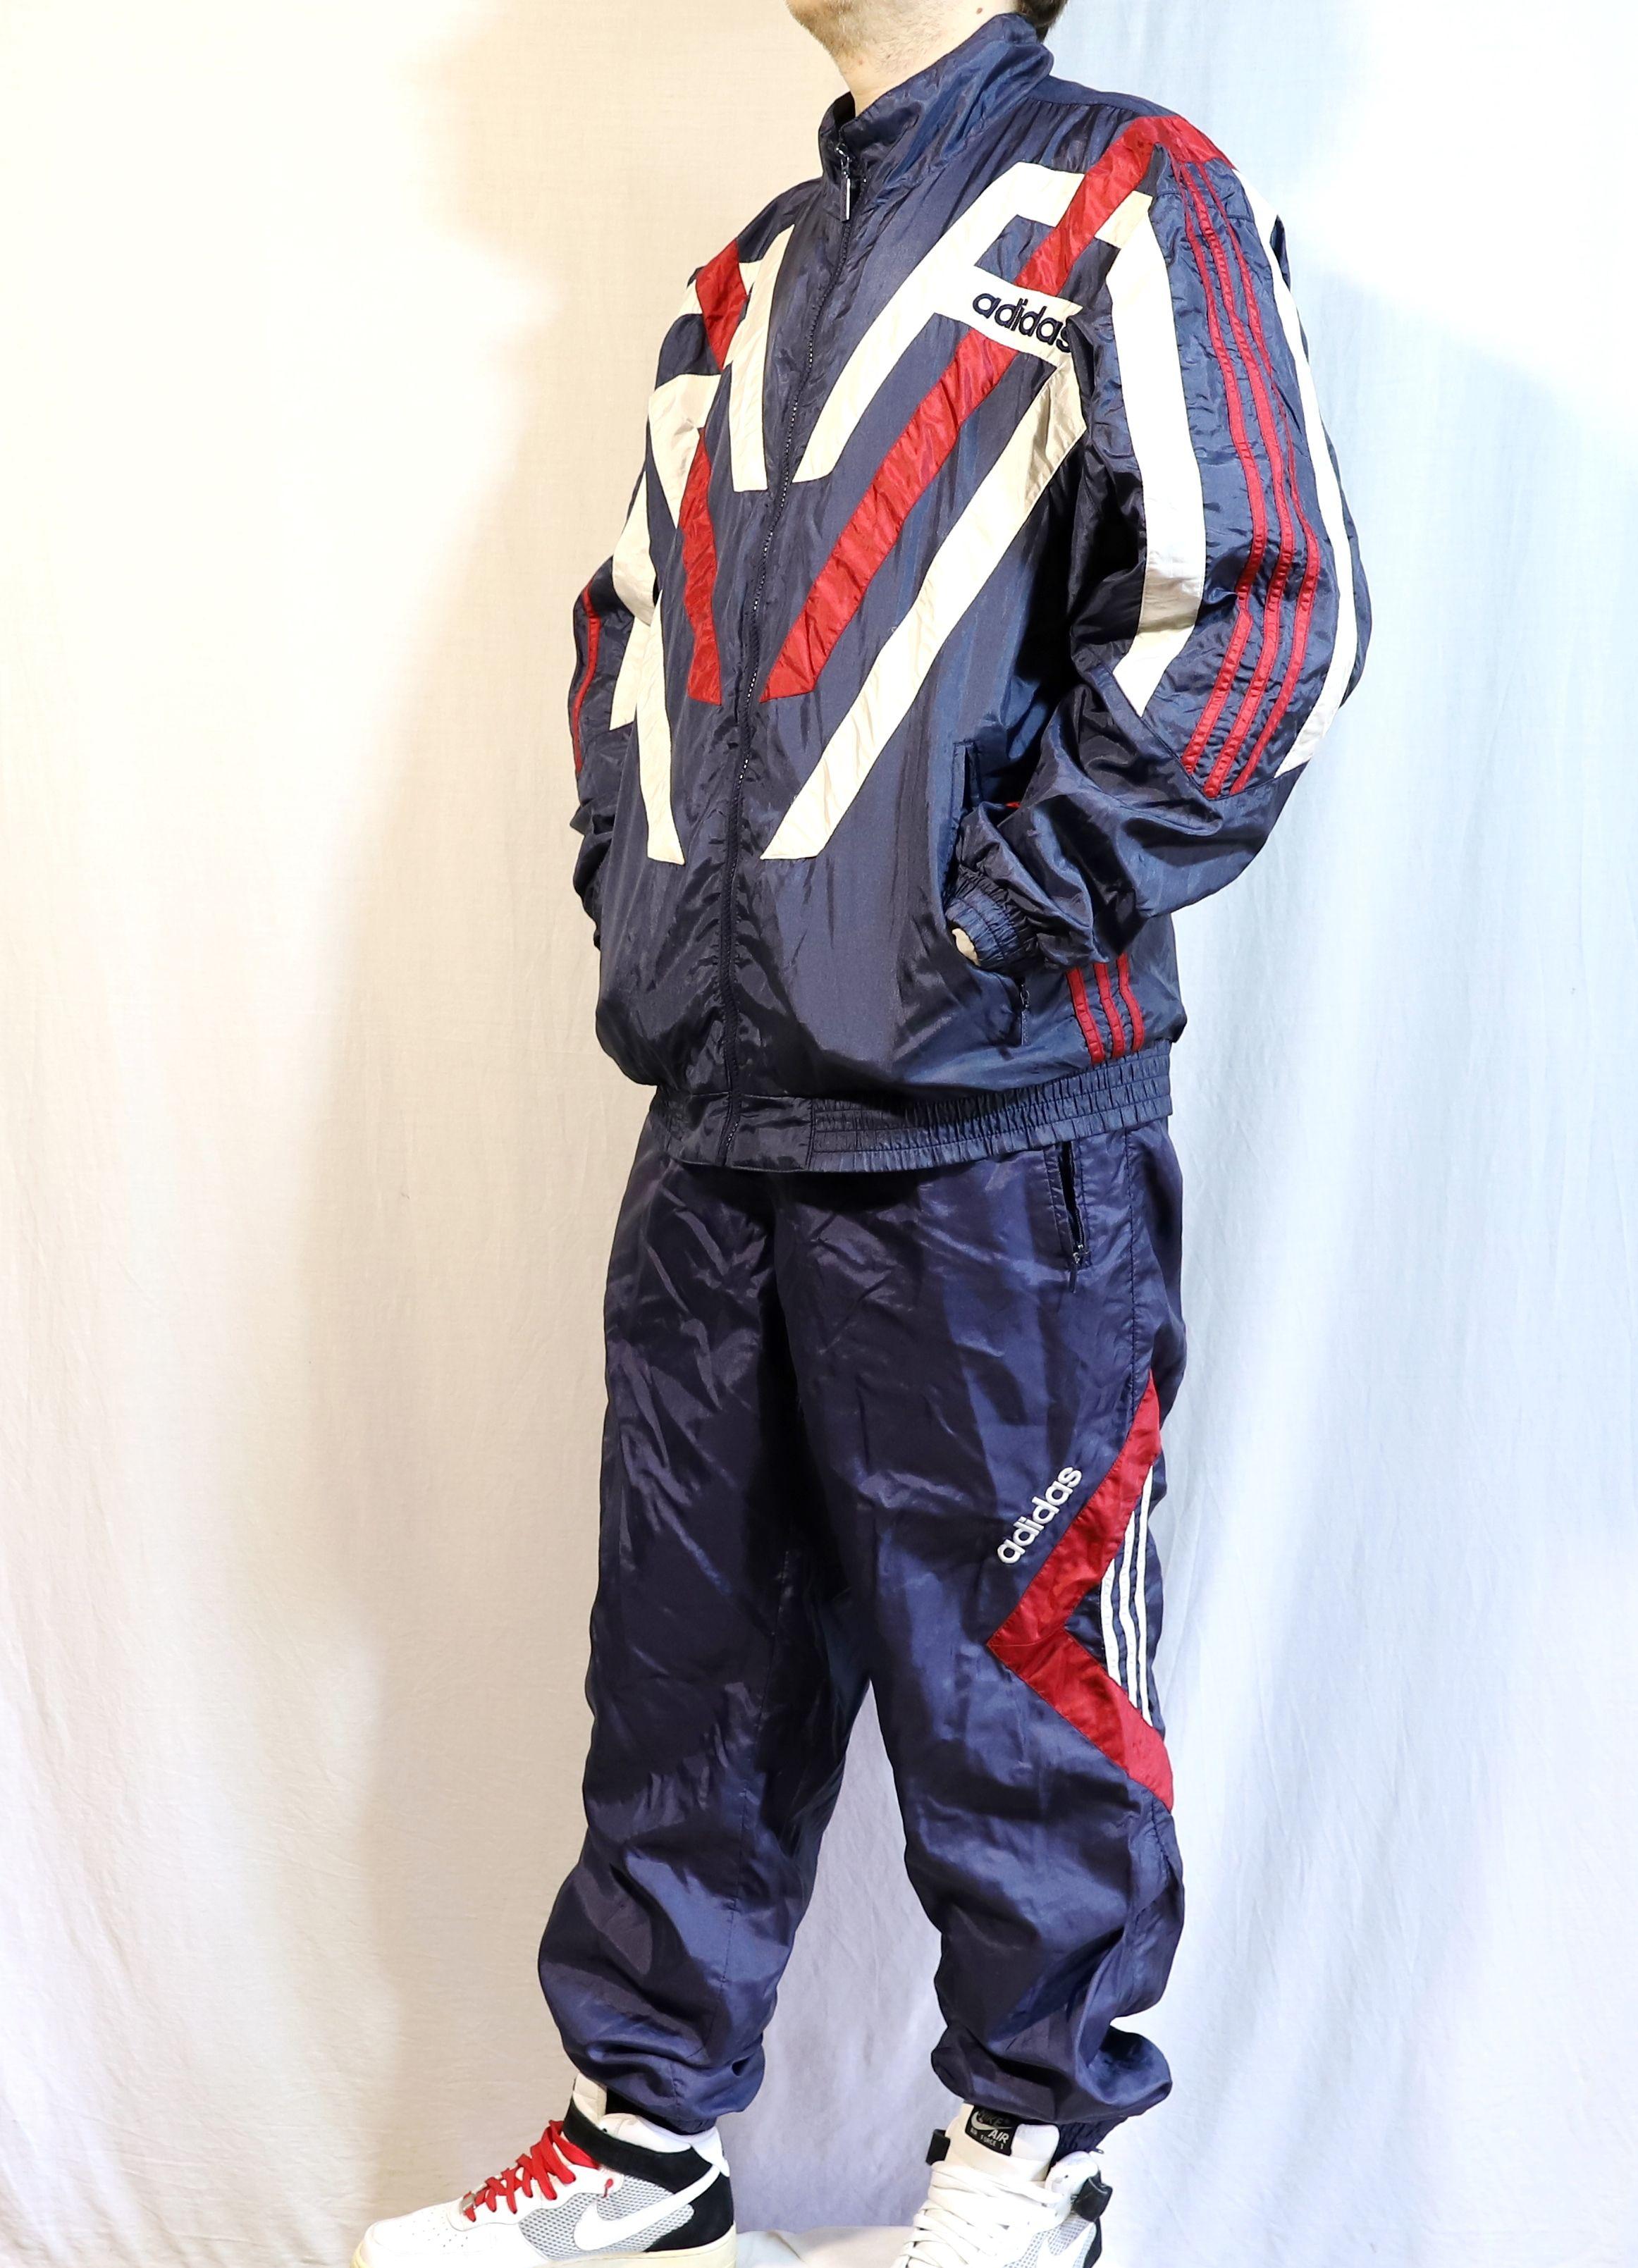 Vintage Adidas tracksuit, retro three stripes mens blue